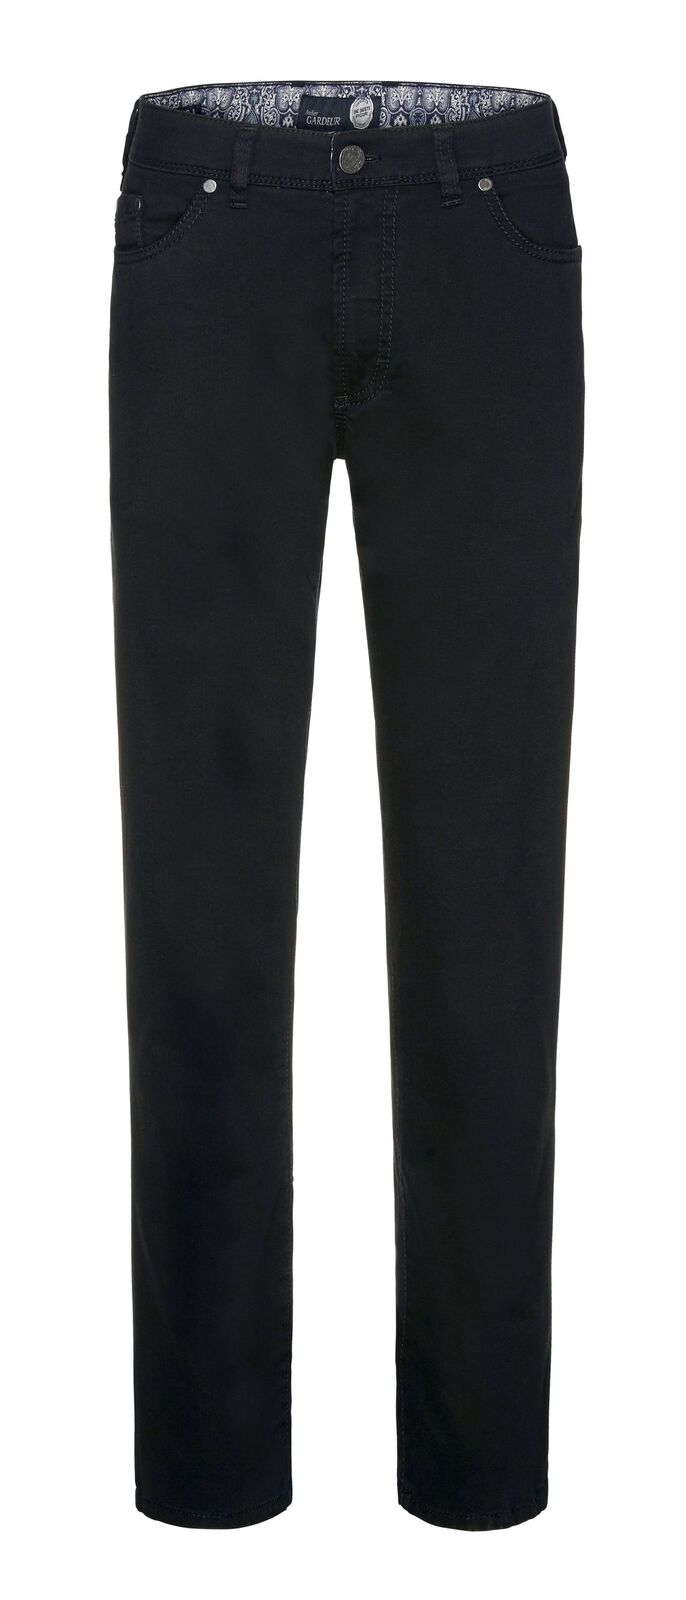 Atelier Gardeur-Regular Fit-Uomo 5 Tasche Pantaloni, Nevio - 8 (411861)